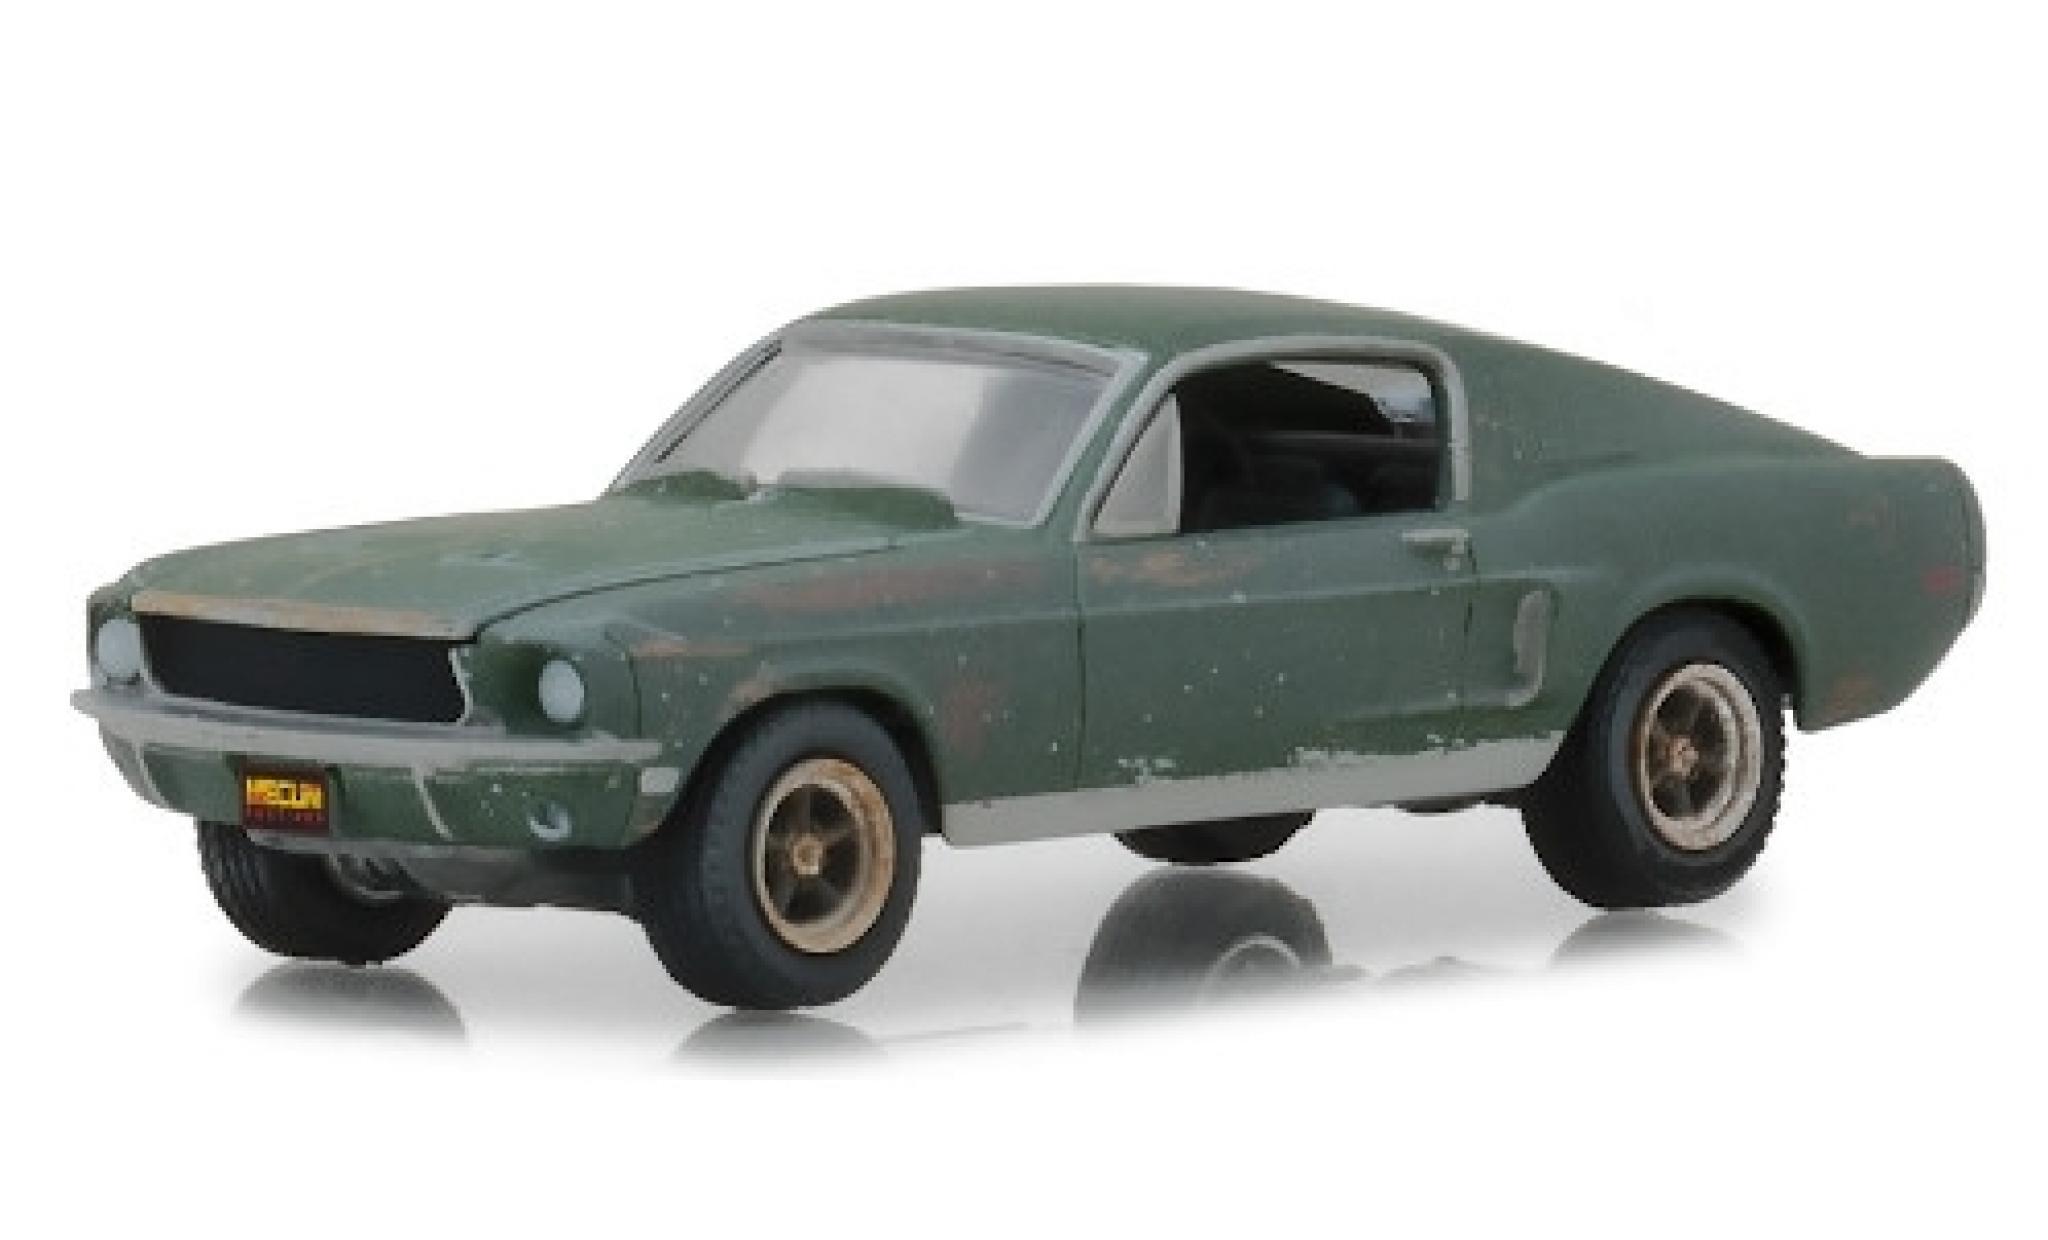 Ford Mustang 1/64 Greenlight GT Fastback Bullitt 1968 unrestauriert mit Stickern